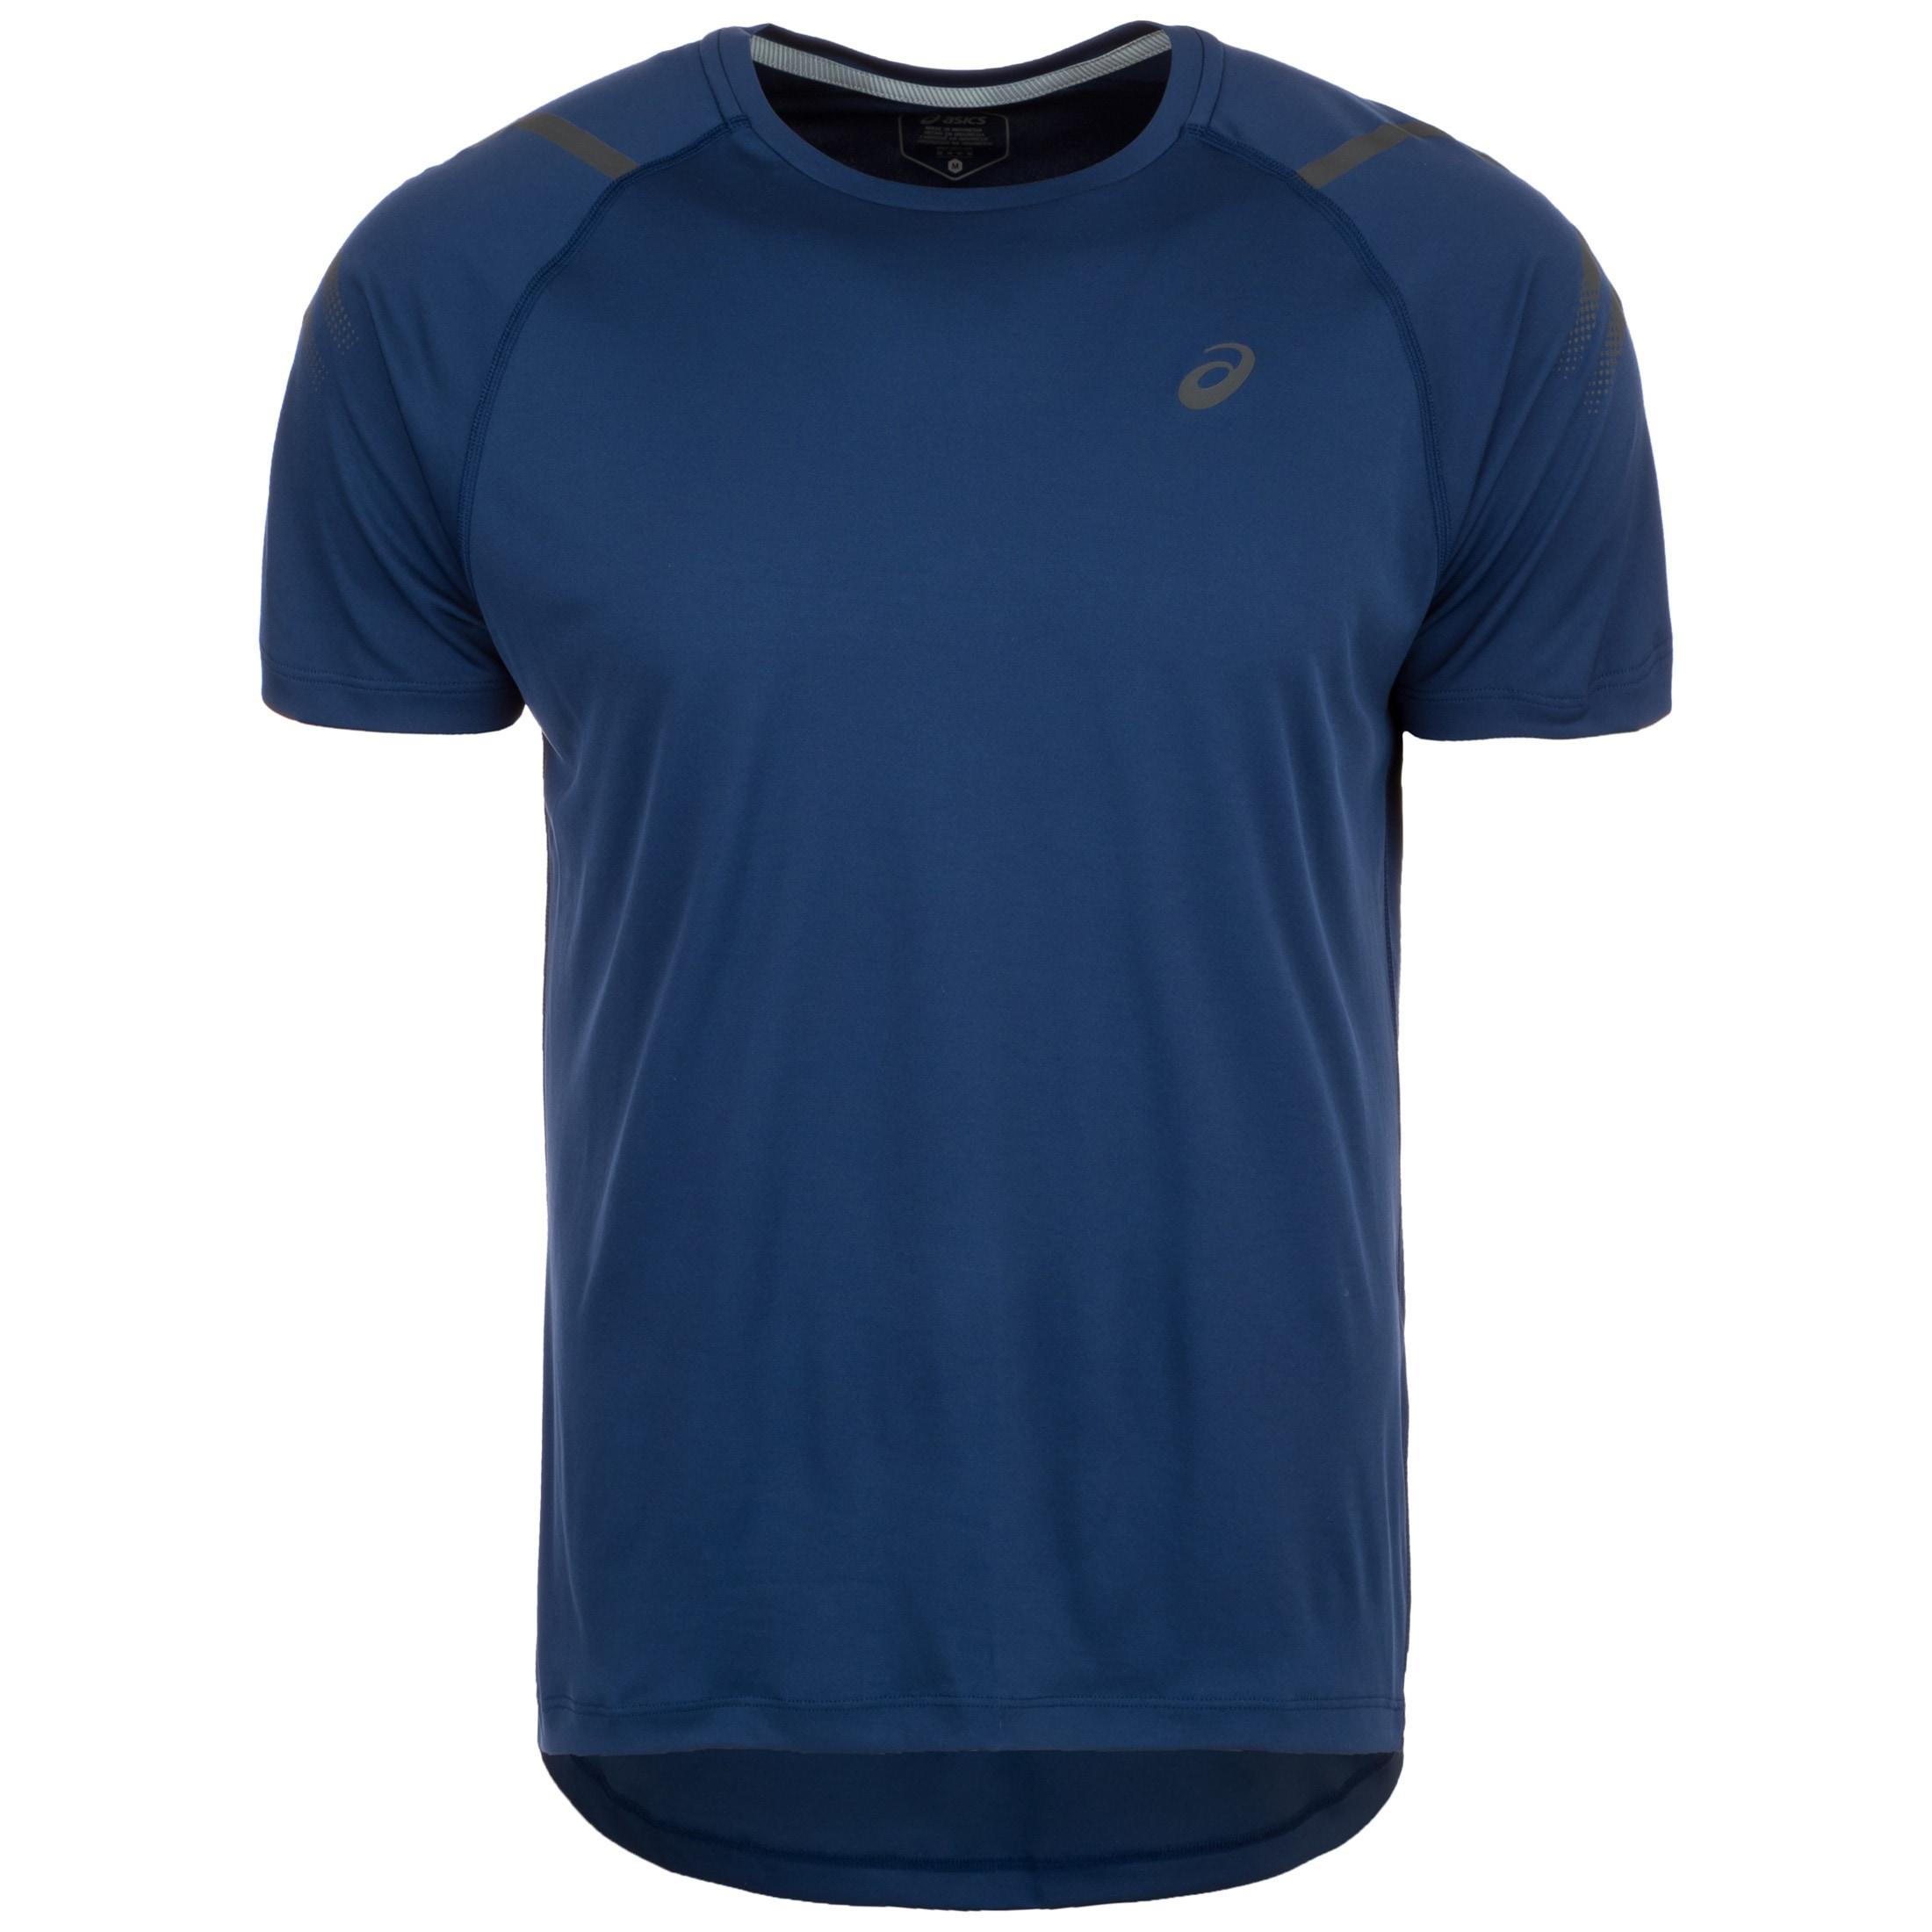 Asics Laufshirt Icon   Sportbekleidung > Sportshirts > Laufshirts   Blau   Asics